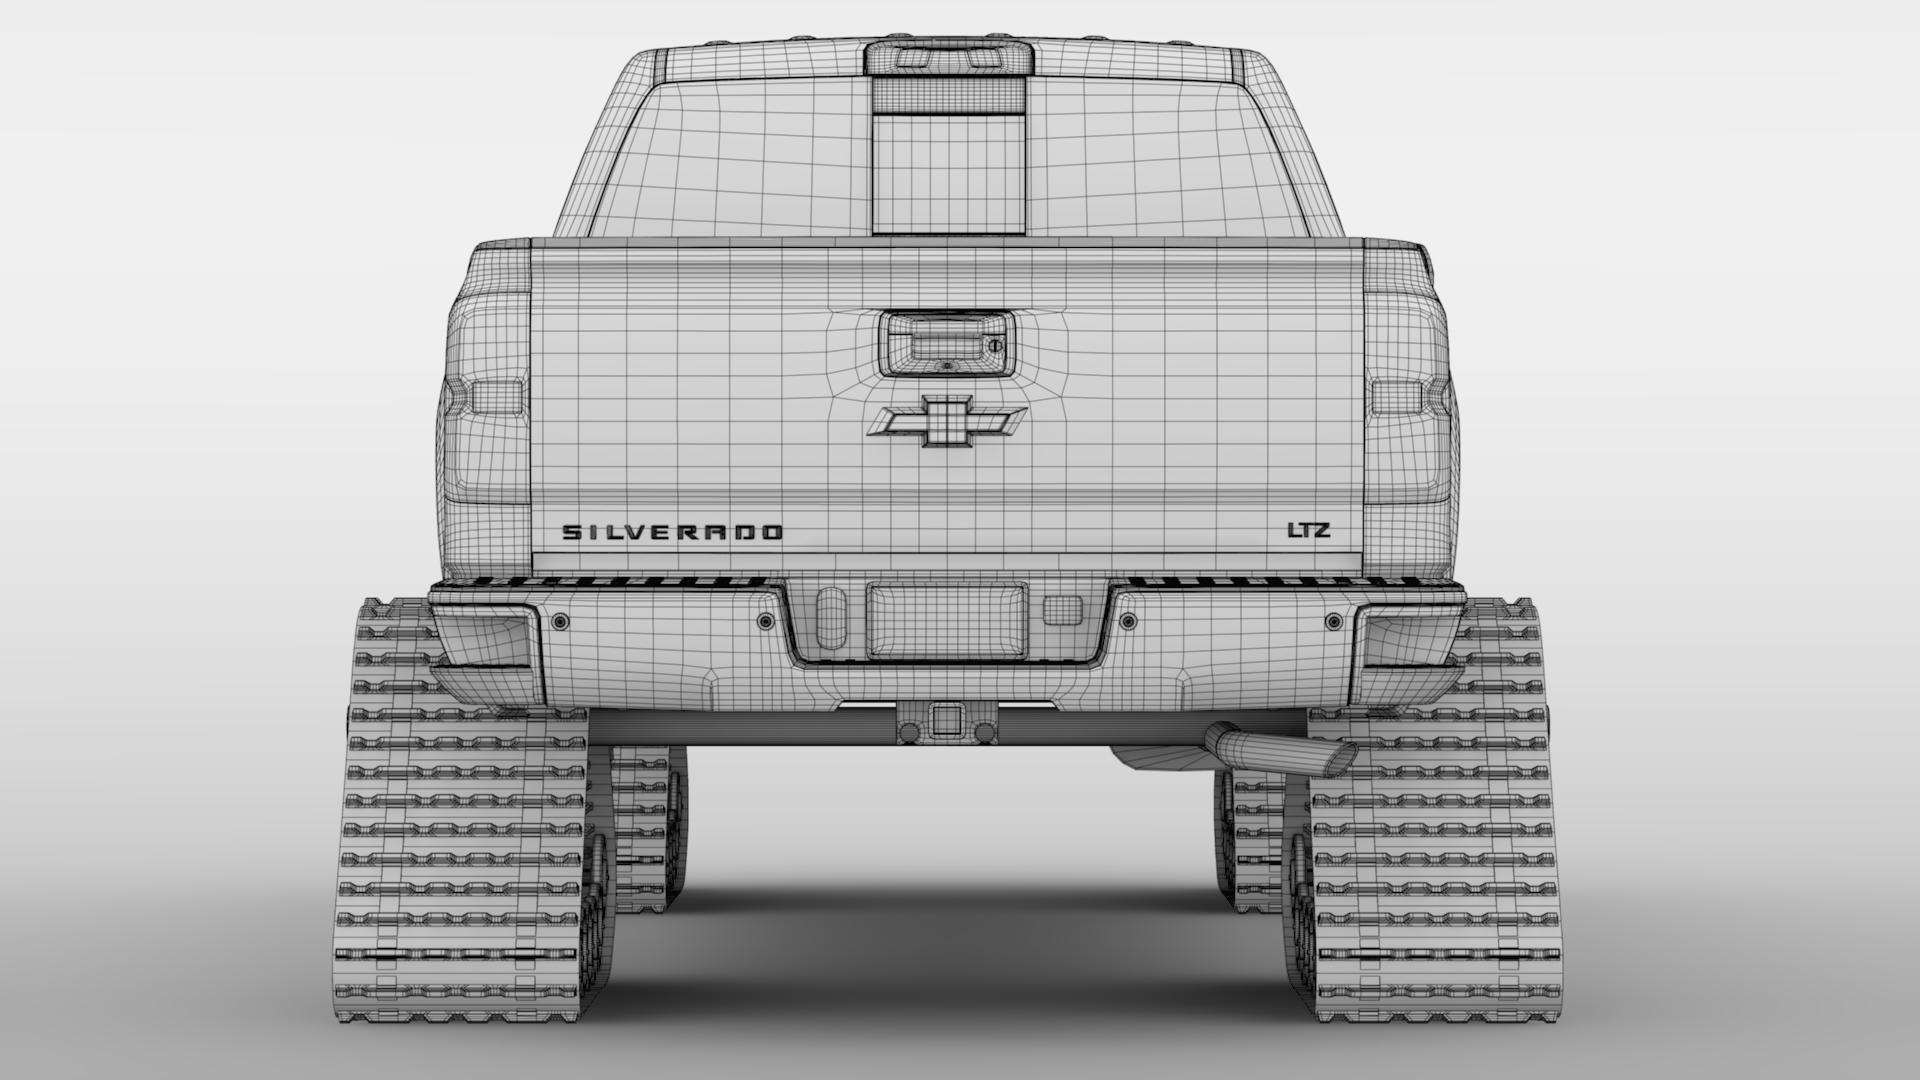 chevrolet silverado ltz z71 crawler 2017 3d model 3ds max fbx c4d lwo ma mb hrc xsi obj 221703